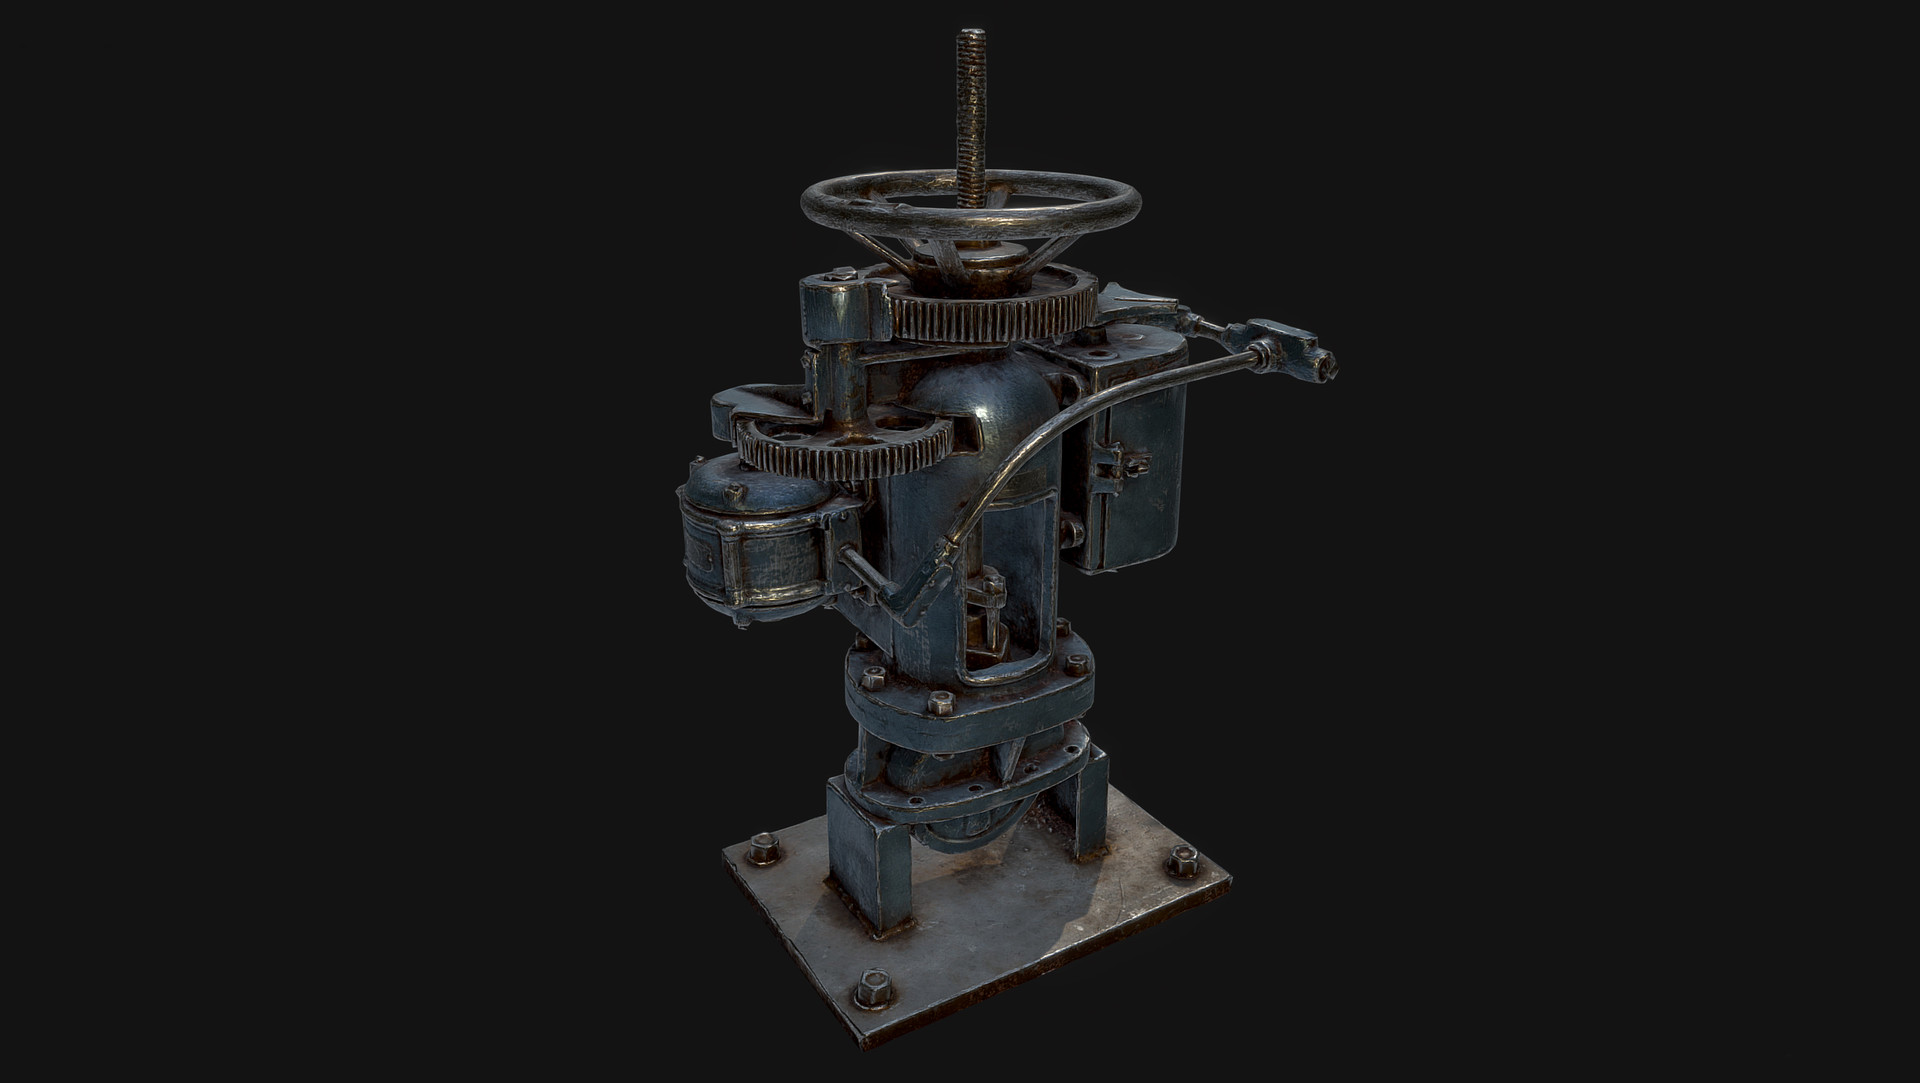 Robert max ramirez valve1